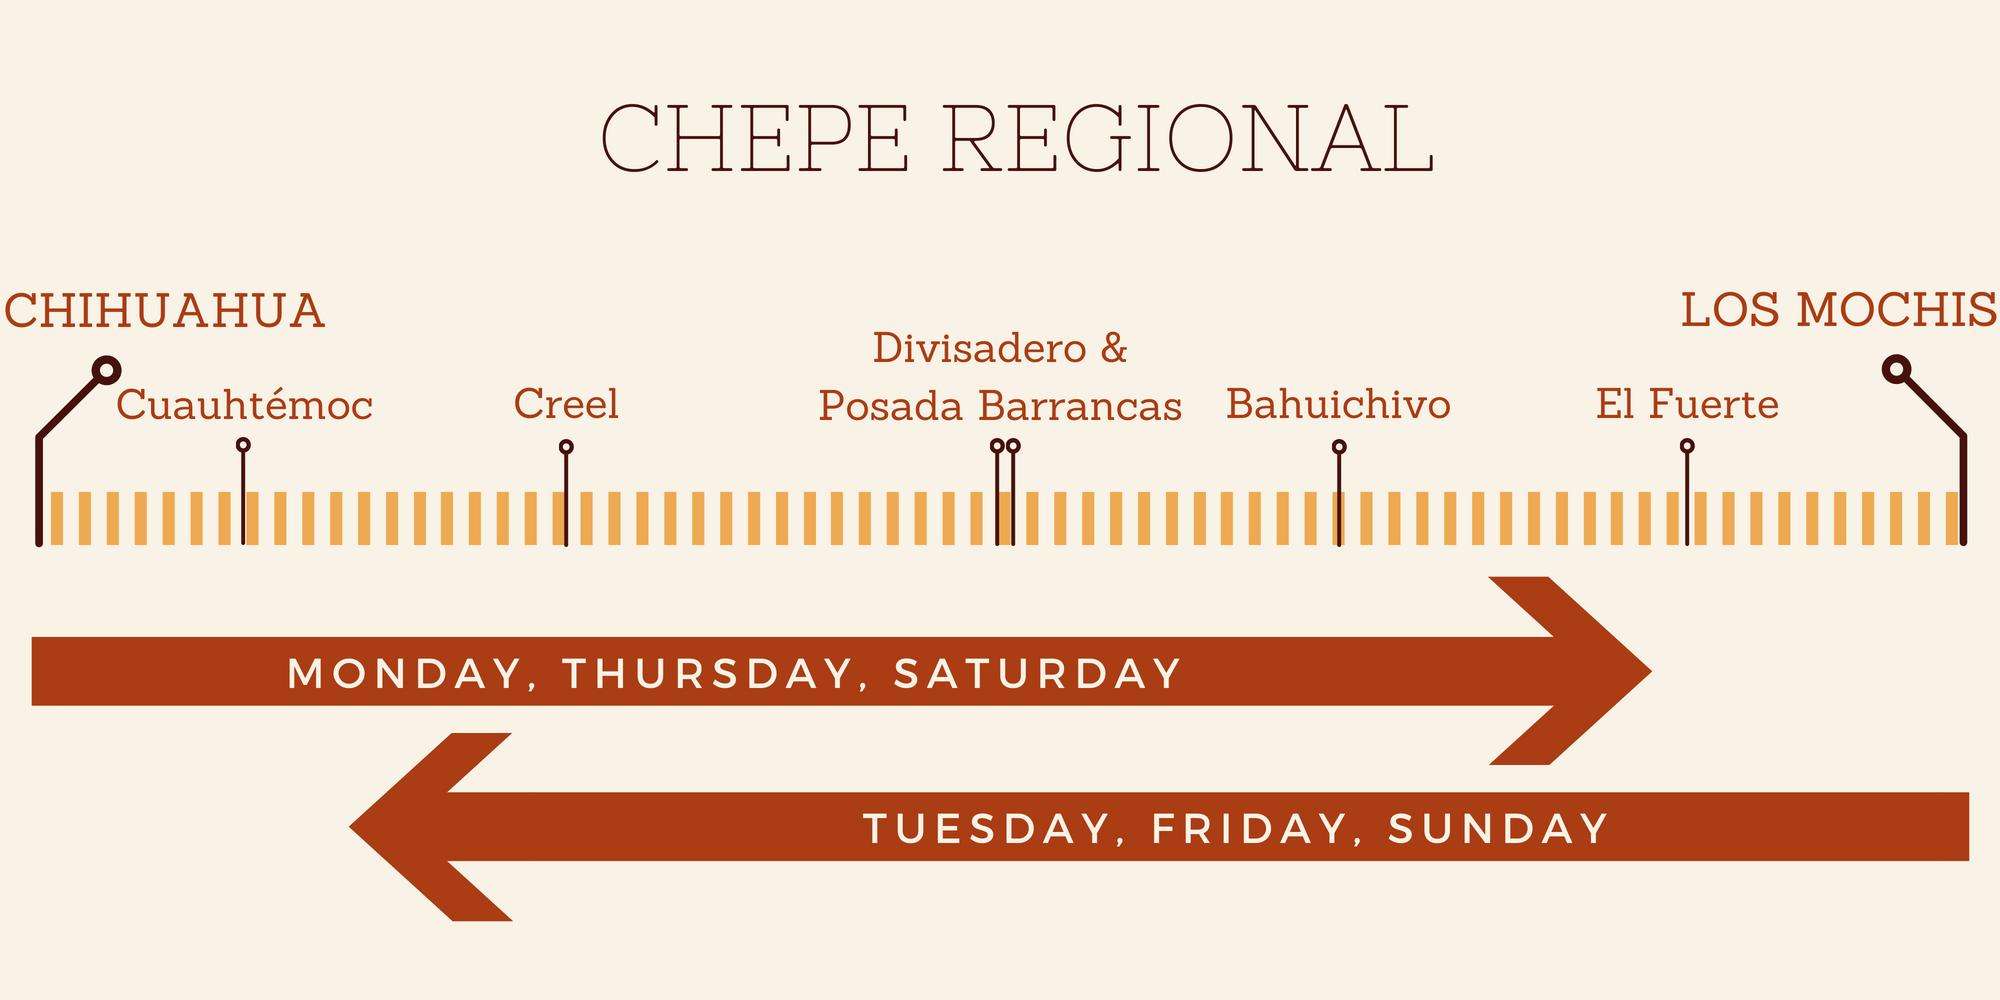 Copper Canyon Train - Chepe Regional Schedule